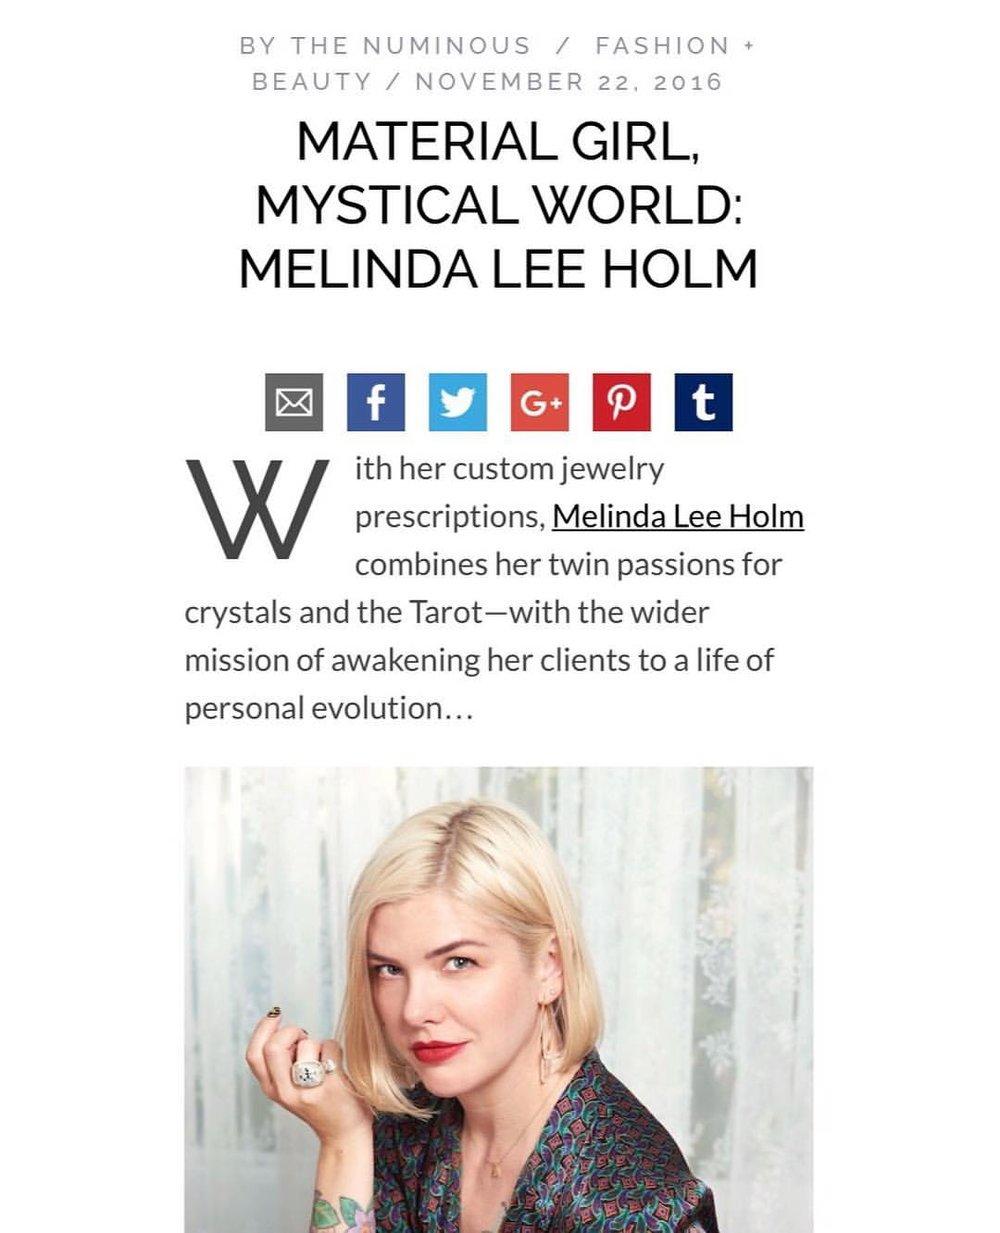 Material Girl, Mystical World: Melinda Lee Holm   The Numinous November 22, 2016